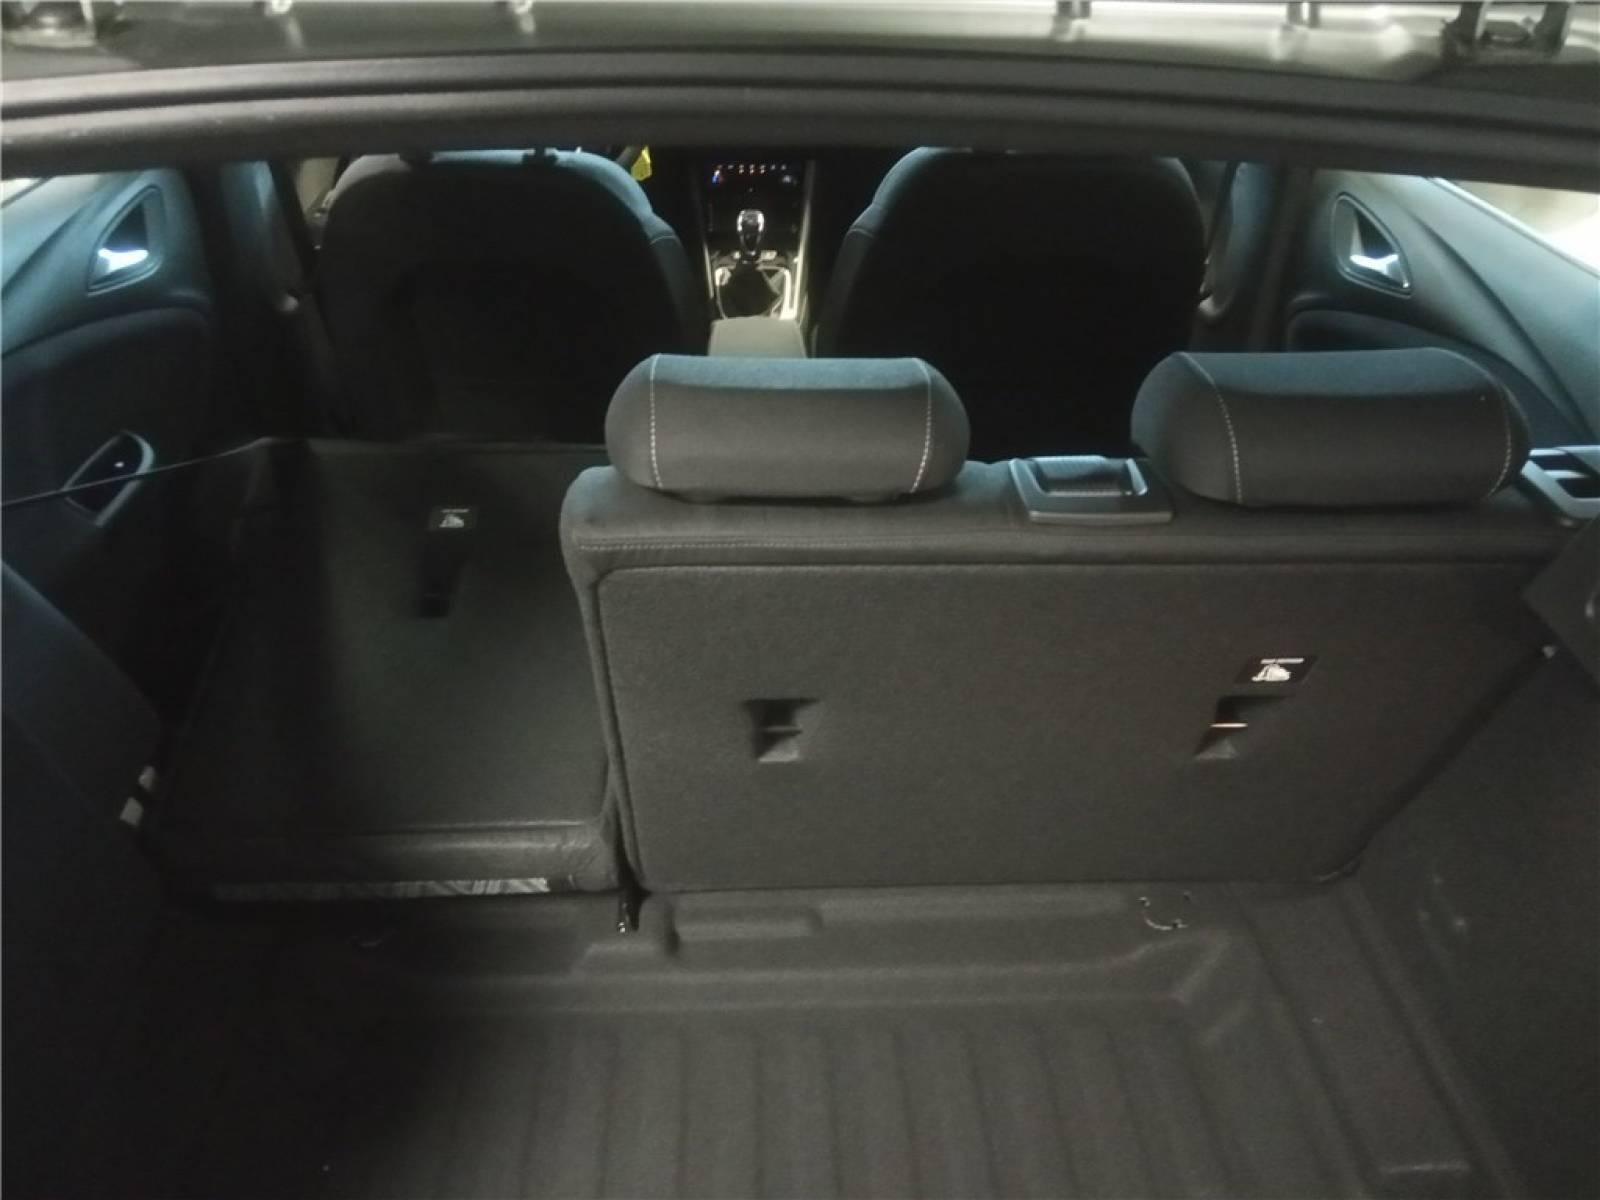 OPEL Astra 1.5 Diesel 105 ch BVM6 - véhicule d'occasion - Groupe Guillet - Opel Magicauto - Chalon-sur-Saône - 71380 - Saint-Marcel - 14